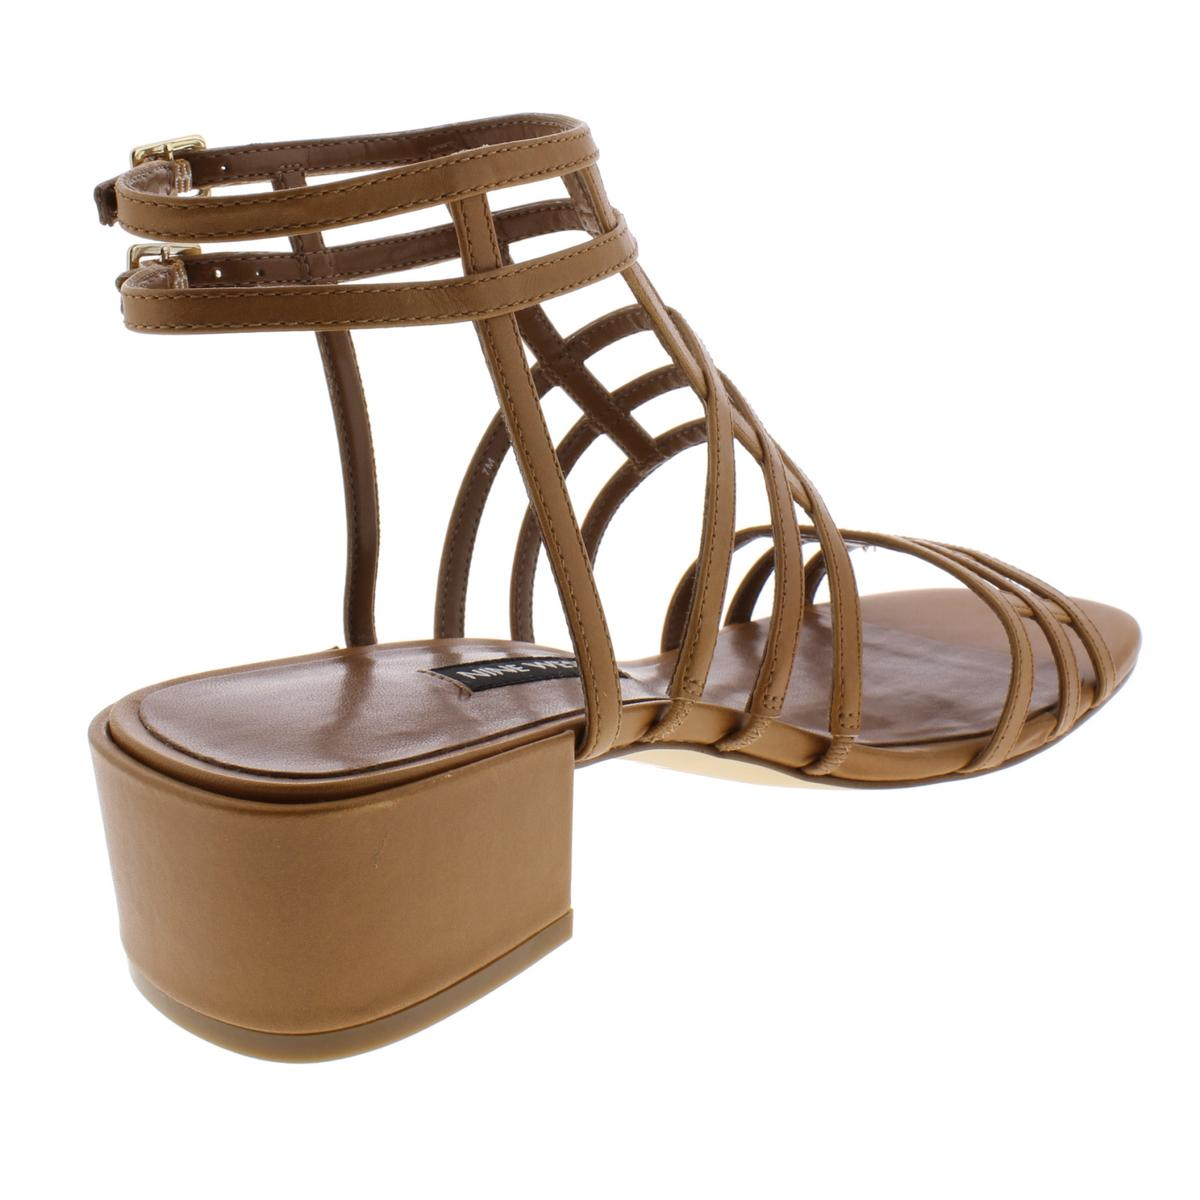 Nine-West-Womens-Xerxes-Leather-Block-Heel-Gladiator-Sandals-Shoes-BHFO-5968 thumbnail 6